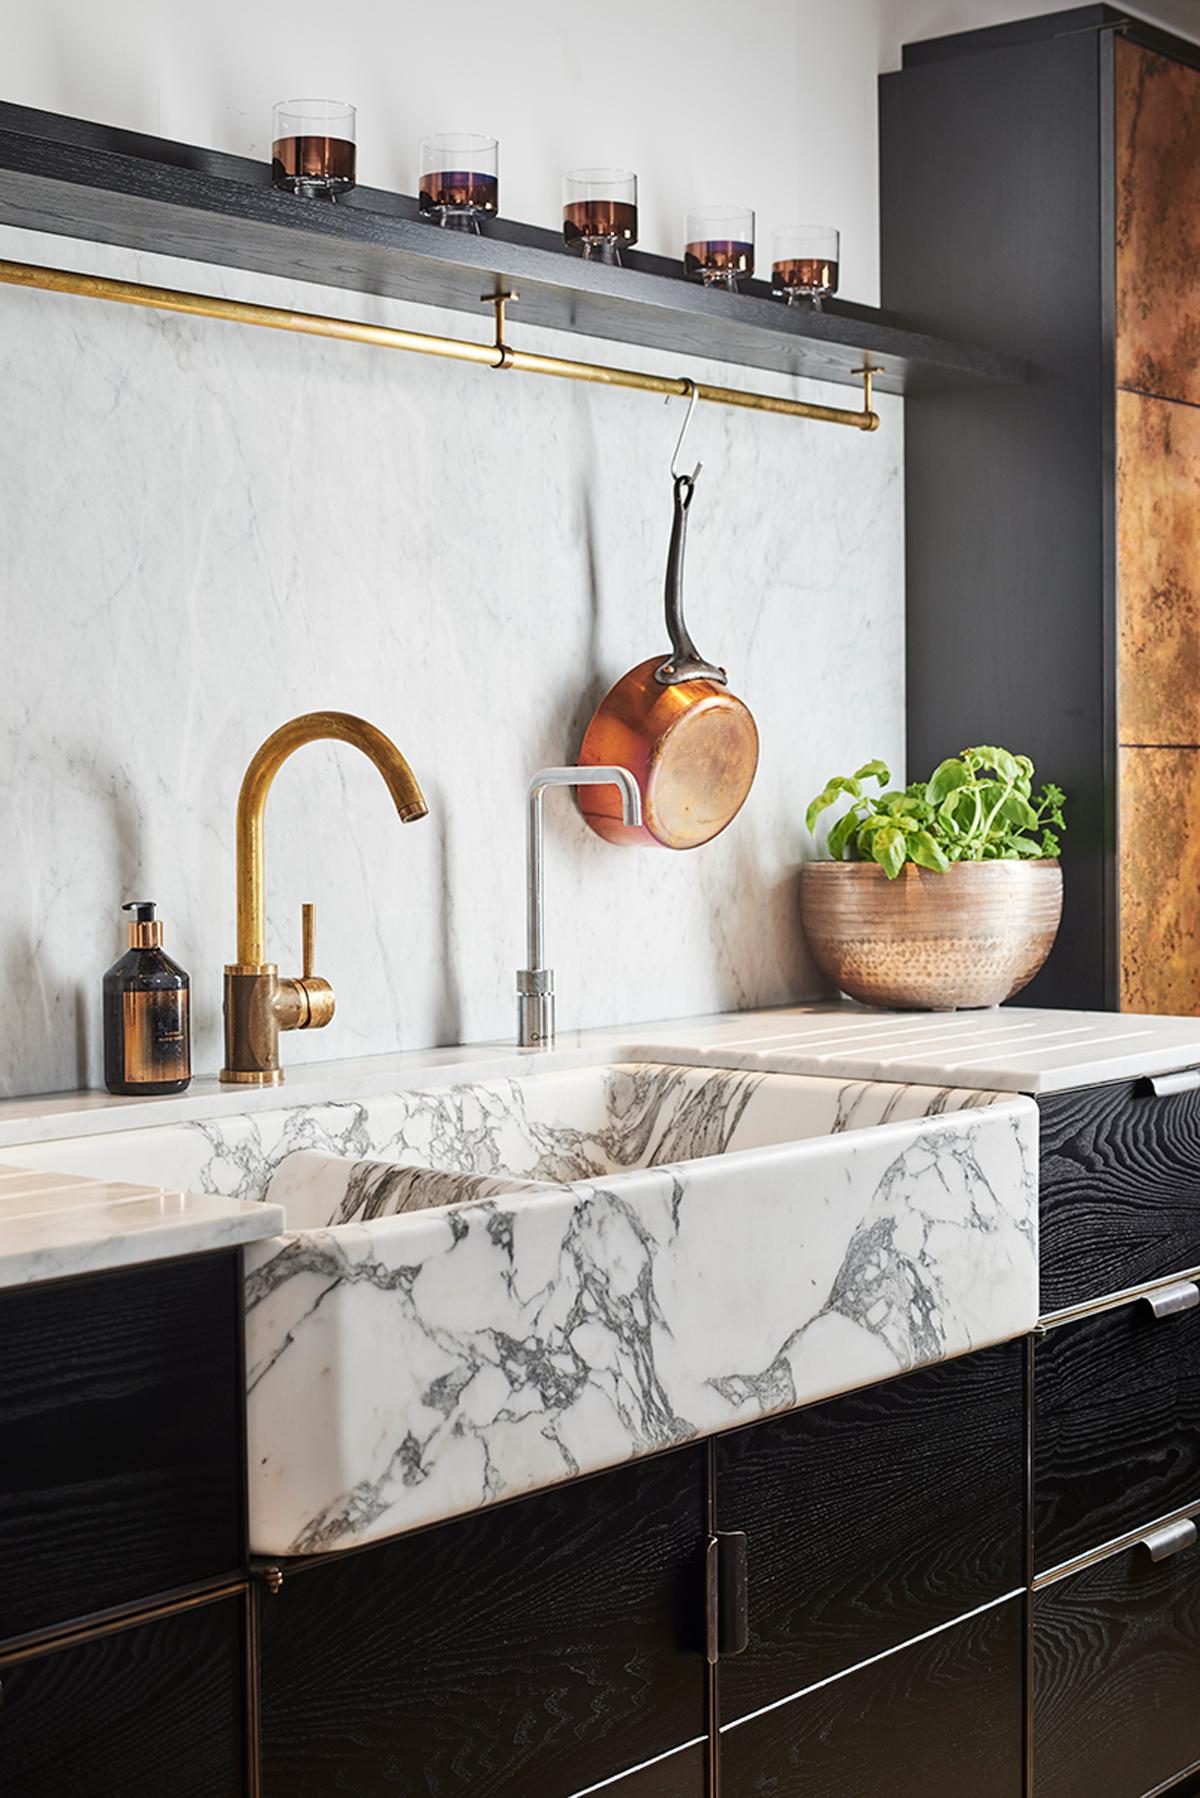 14 Must Visit Kitchen Showrooms In London And Se For Design Inspiration Livingetc